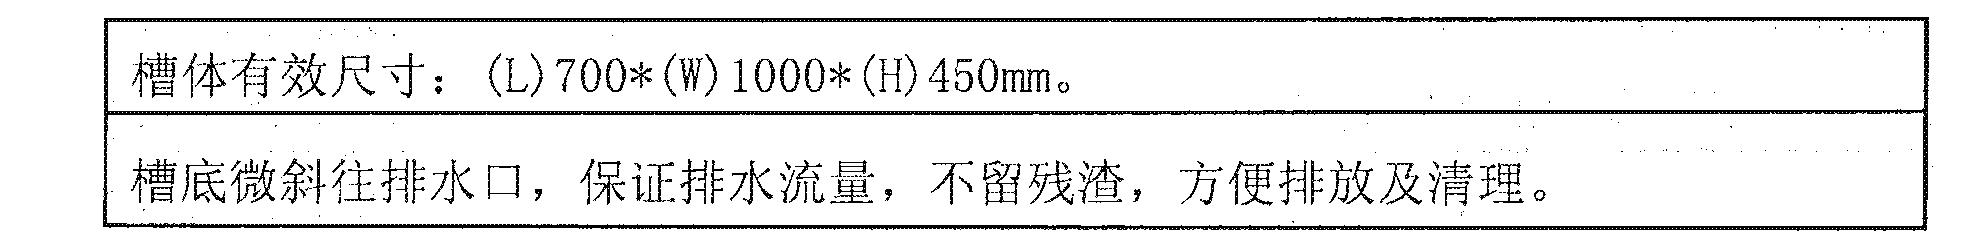 Figure CN204035120UD00113